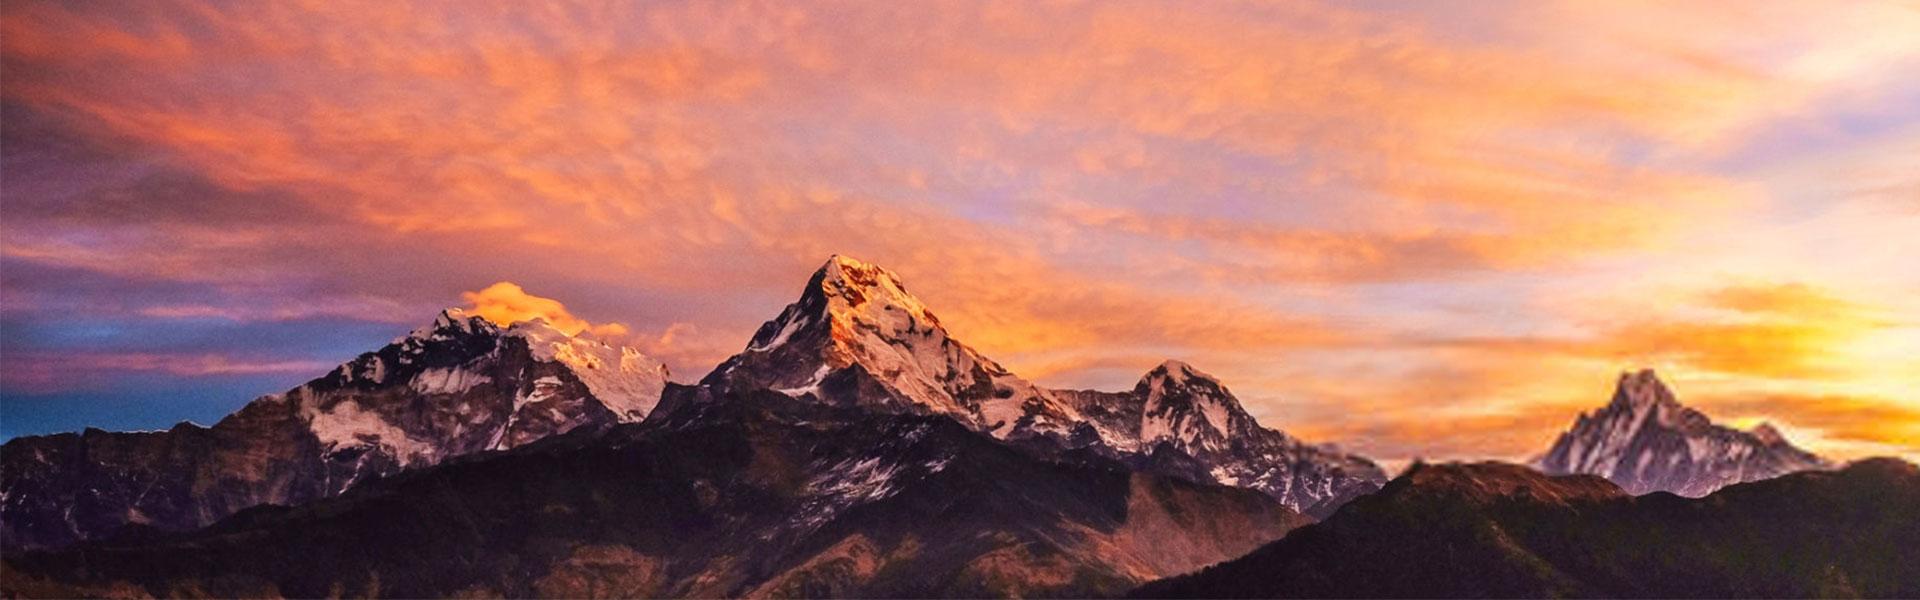 Trekking in Nepal: Nepal Trekking, Trekking Nepal